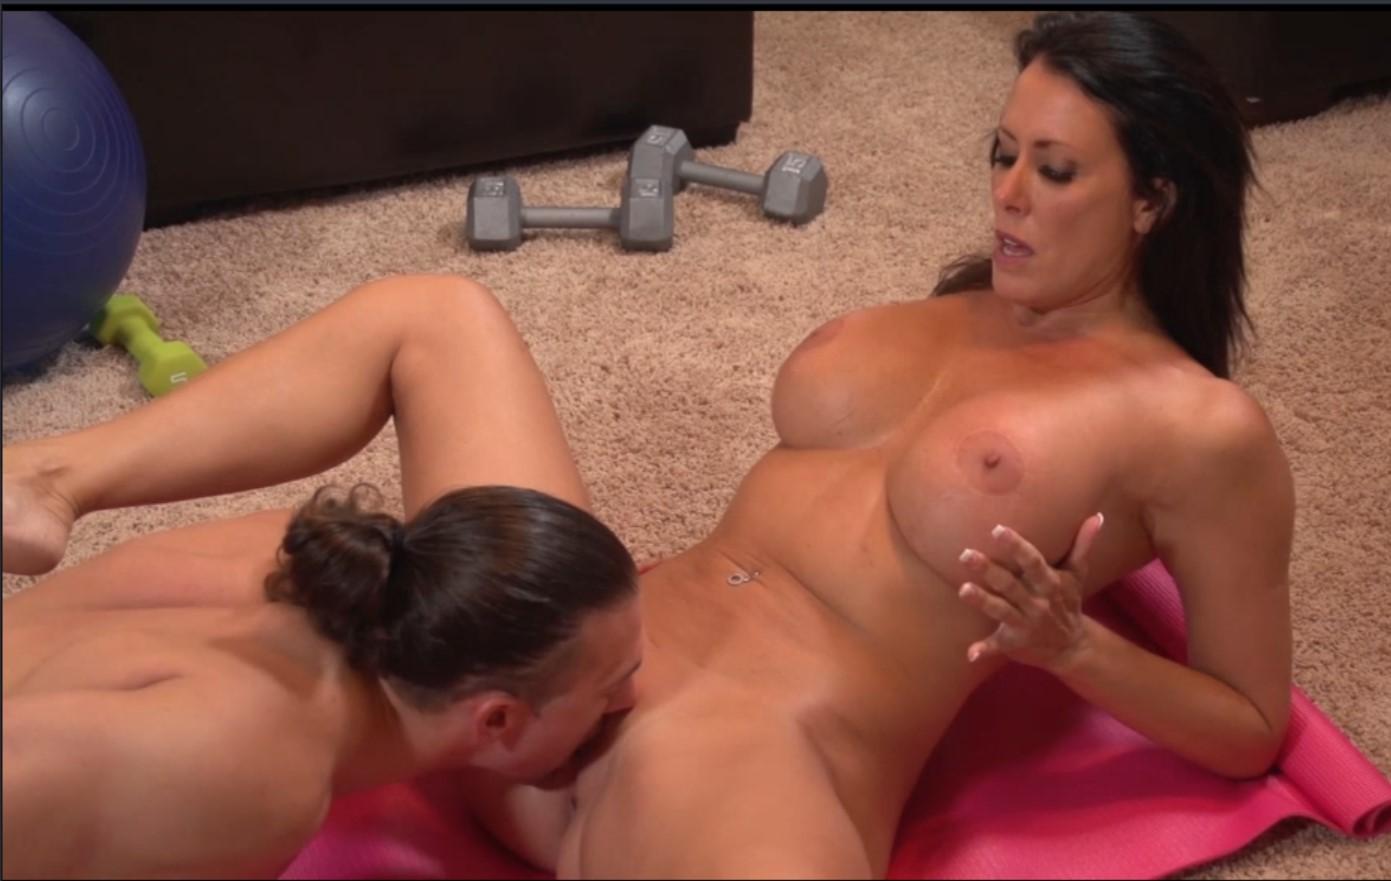 Порно инцест видео формате 3gp